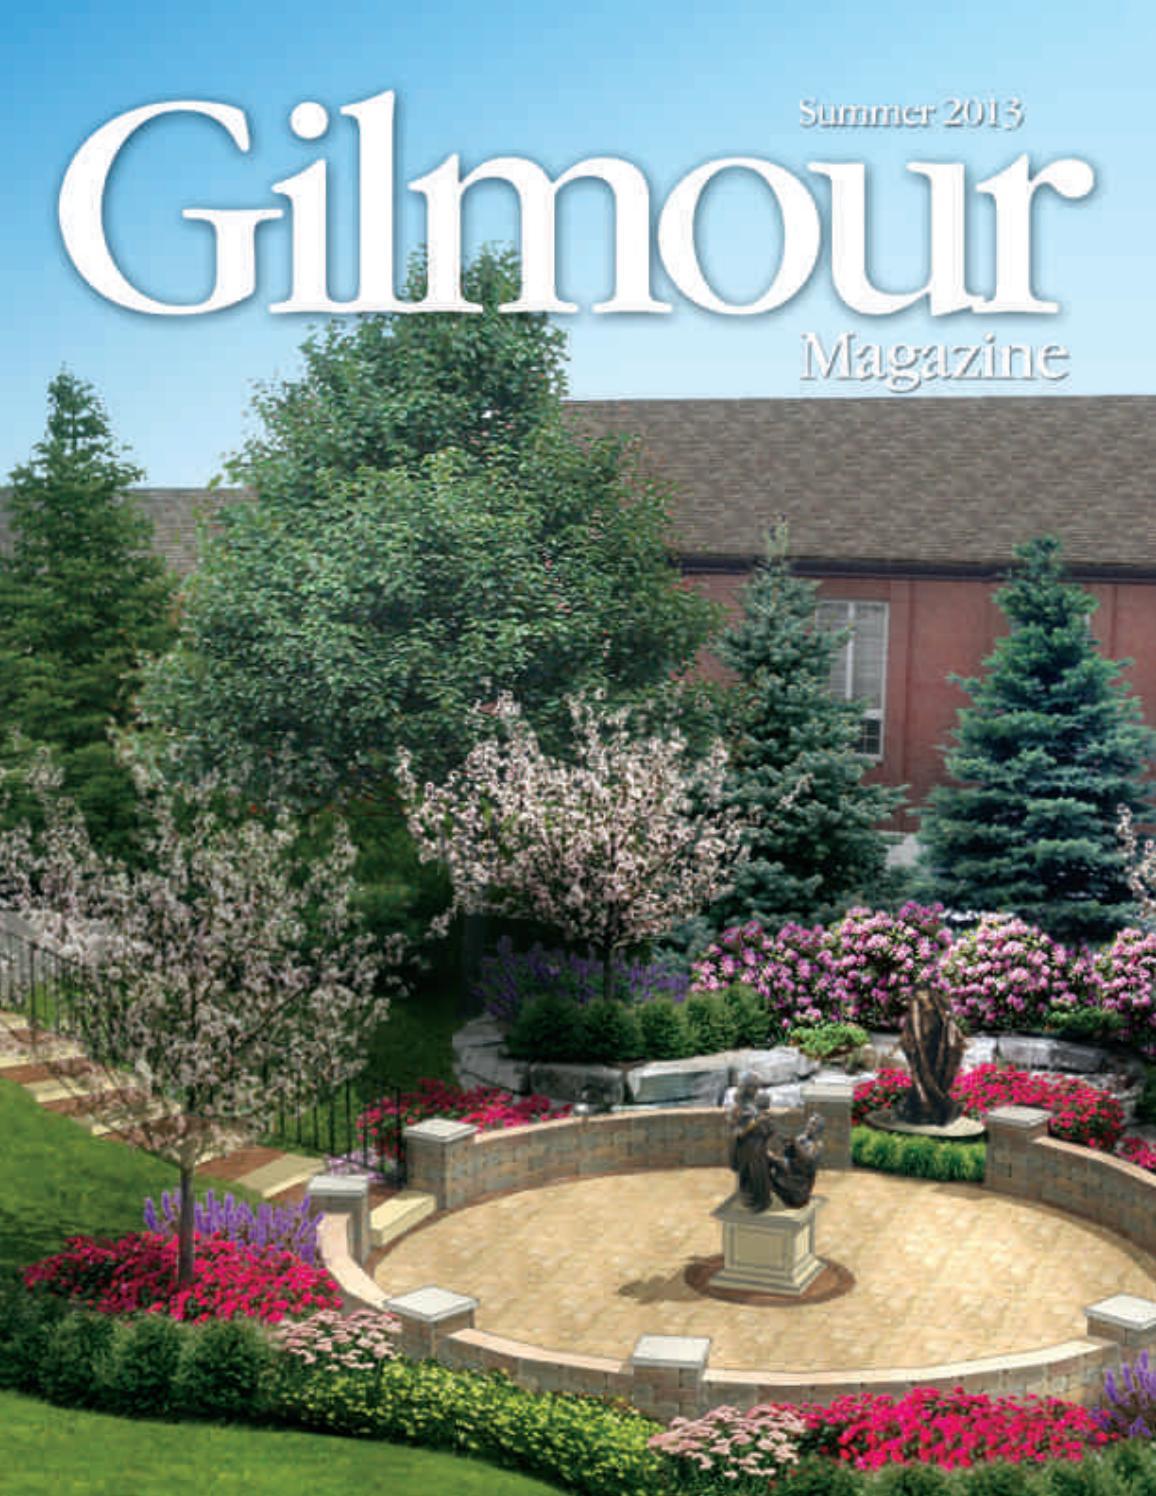 Gilmour Academy Magazine Summer 2013 By Gilmour Academy Issuu